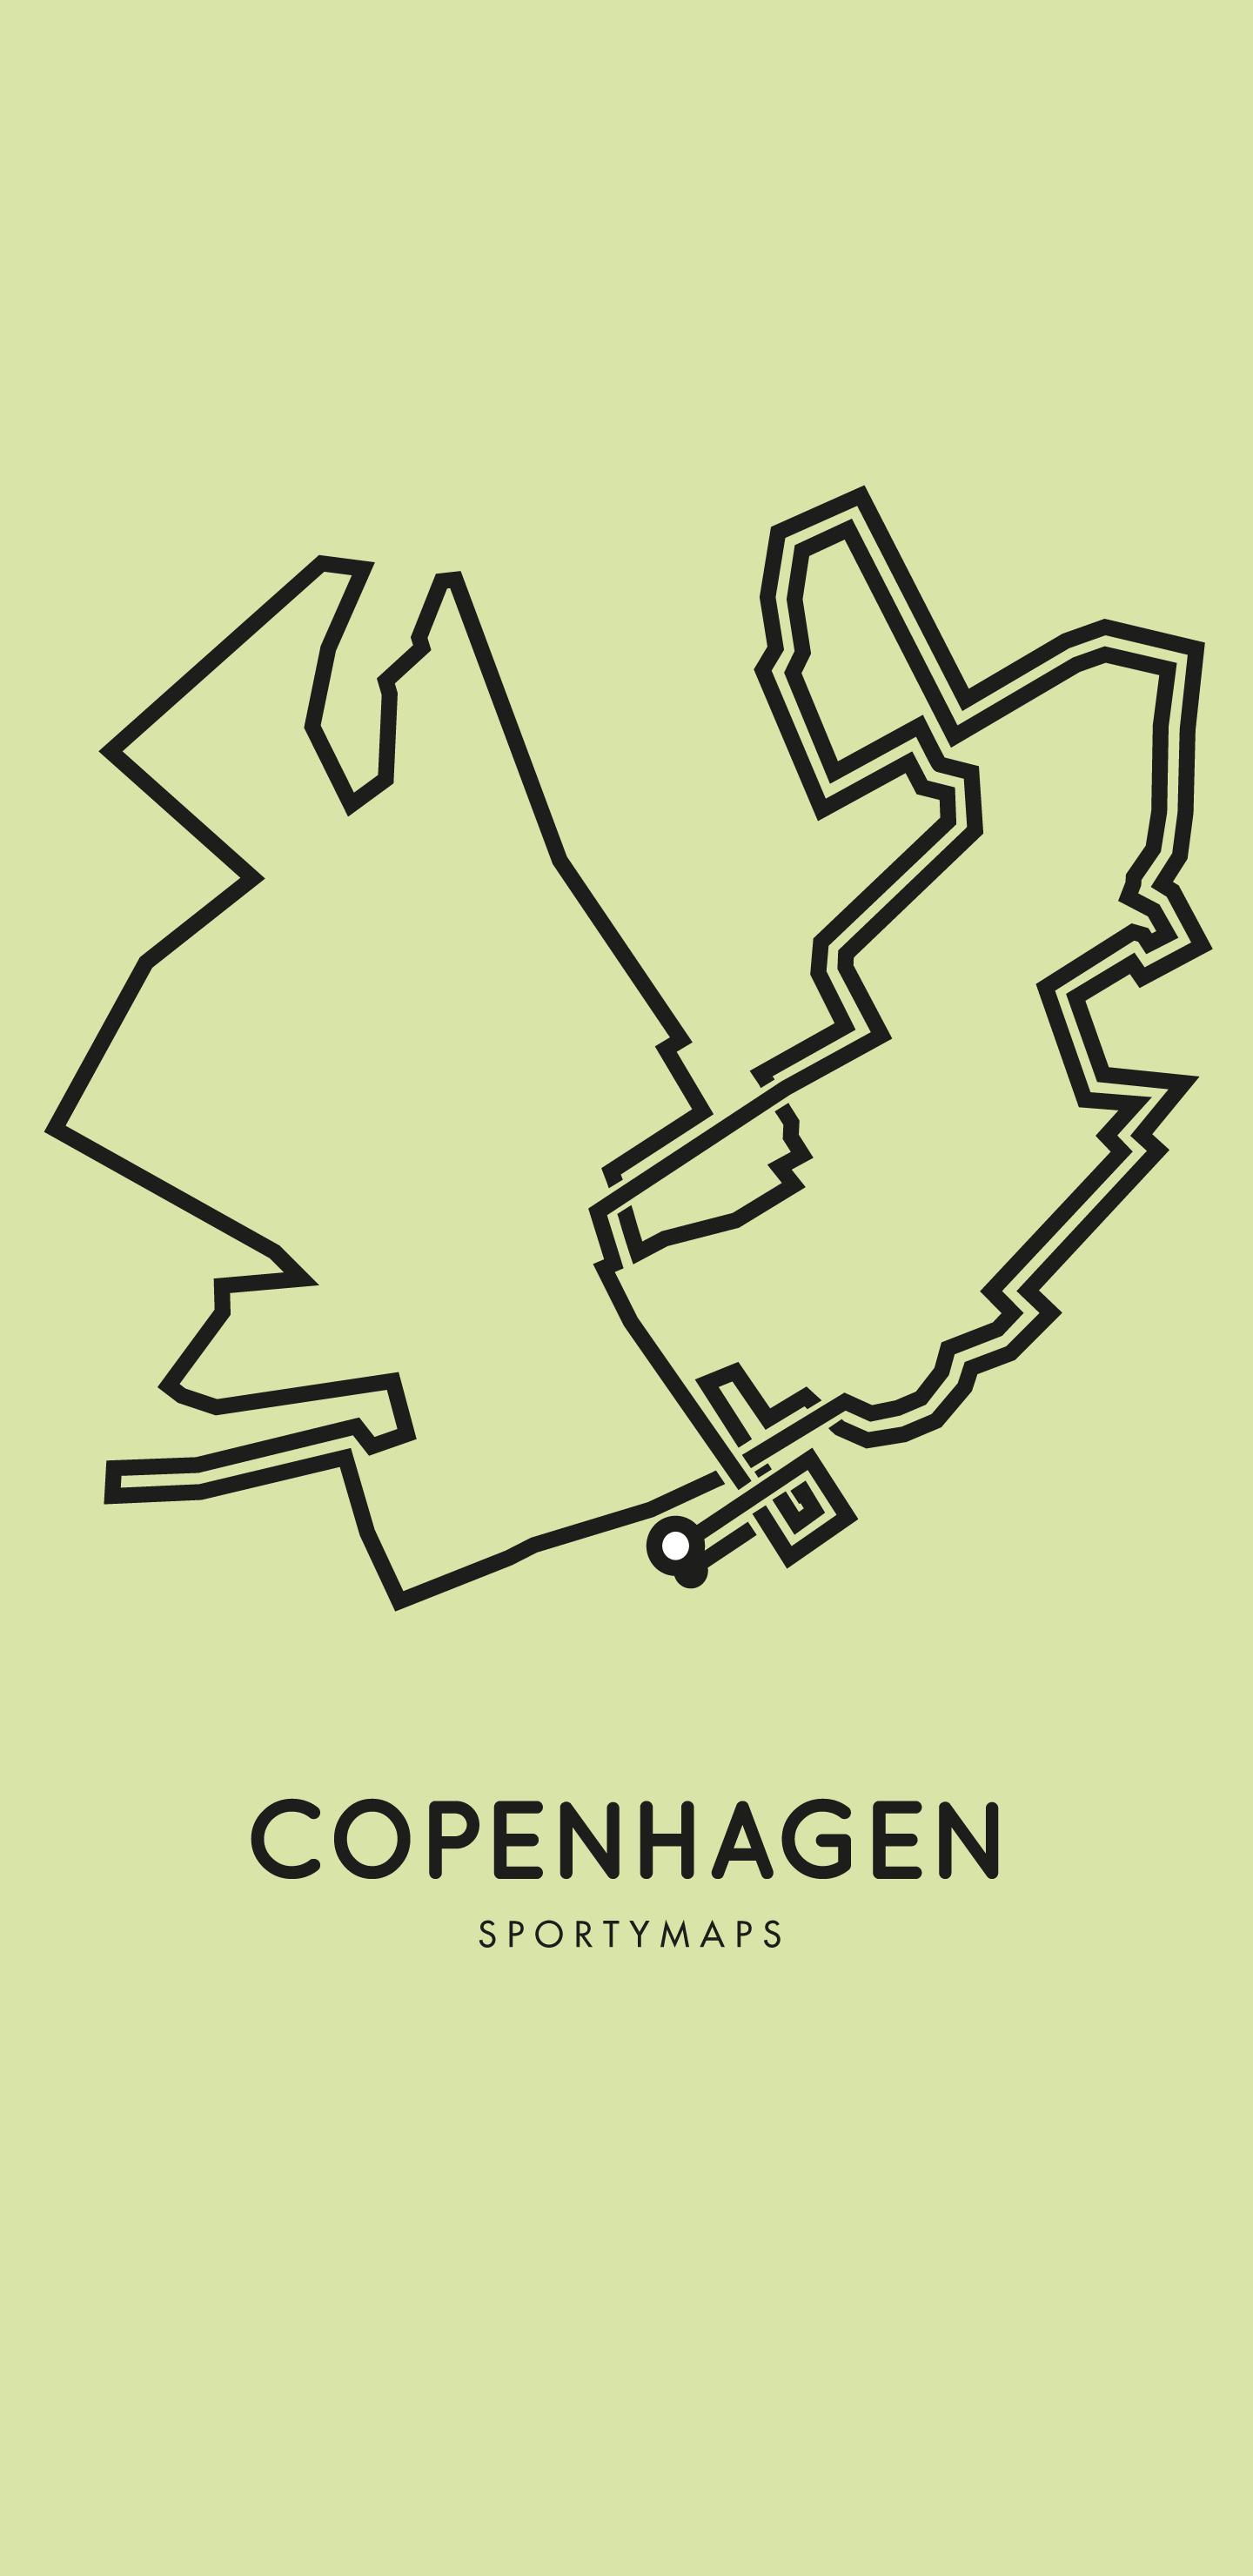 Sportymaps-Copenhagen-marathon-green